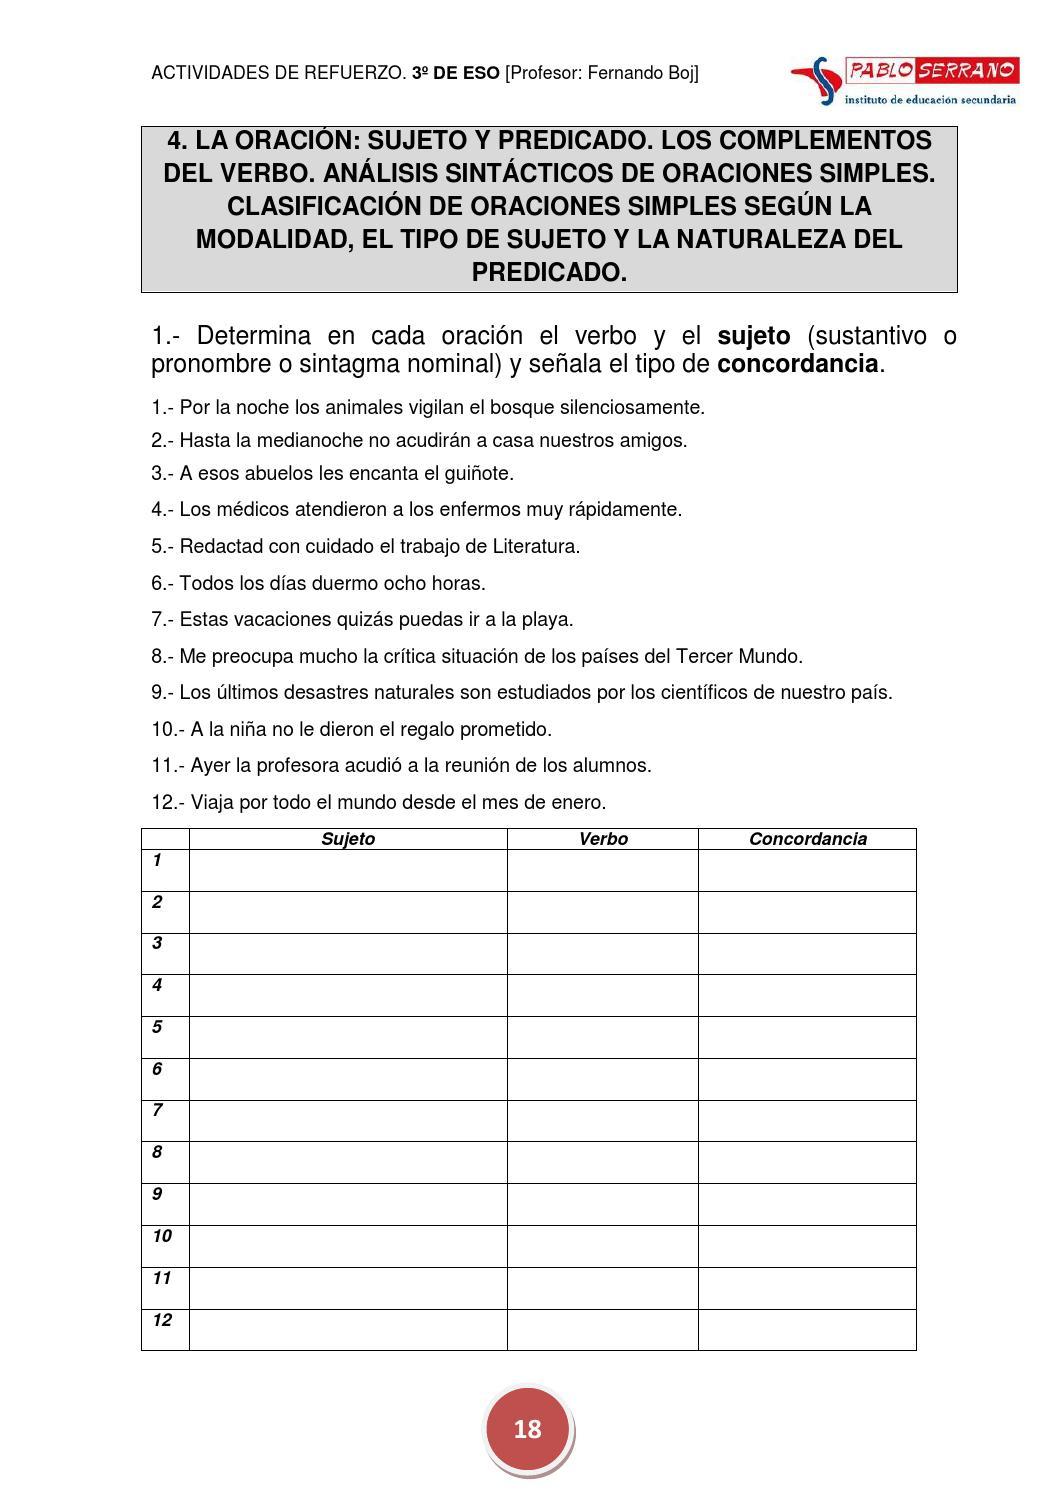 88b1ab688532 Actividades de refuerzo de LENGUA CASTELLANA Y LITERATURA. 3º DE ESO by  Fernando Boj - issuu